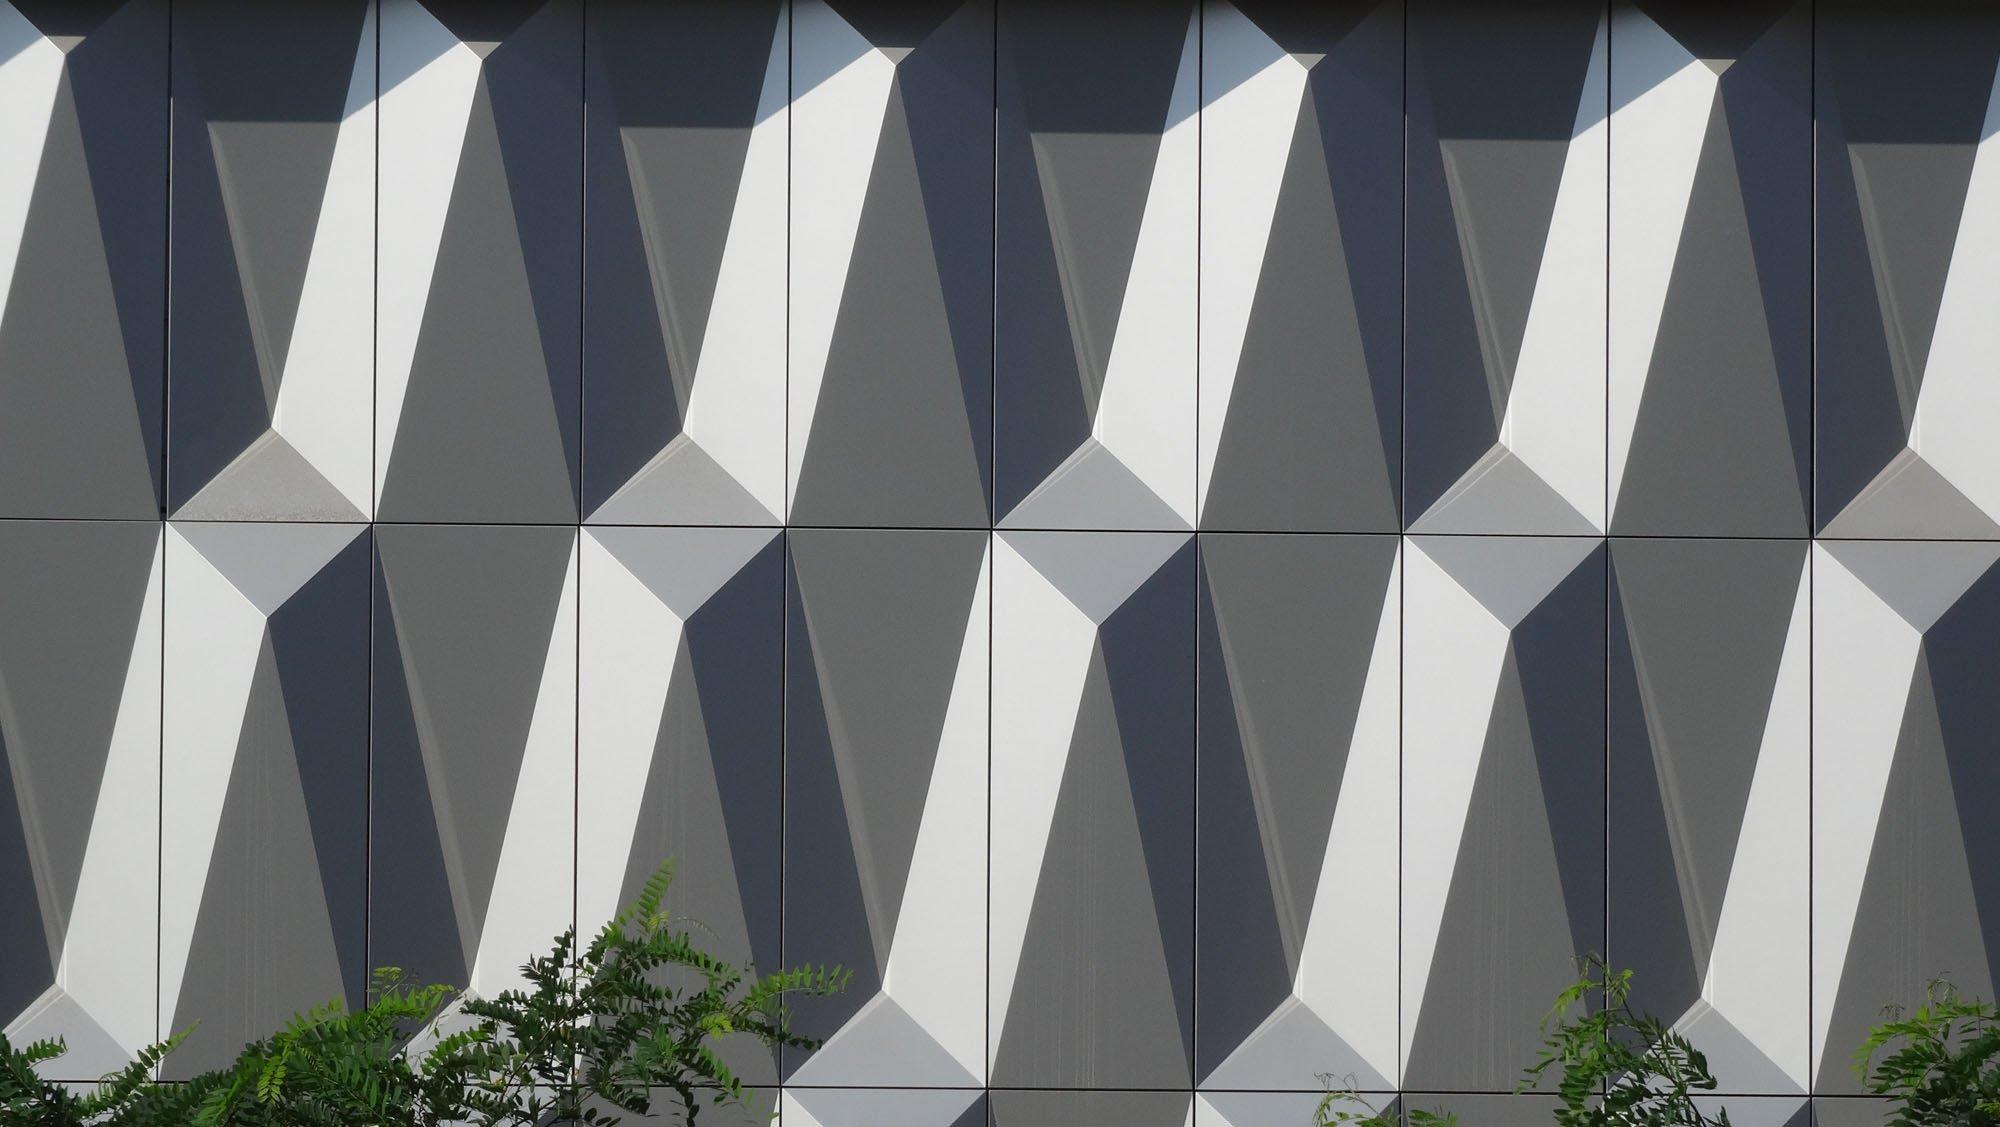 Bauhaus Berlin Halensee bauhaus halensee in berlin fassade gewerbe industrie